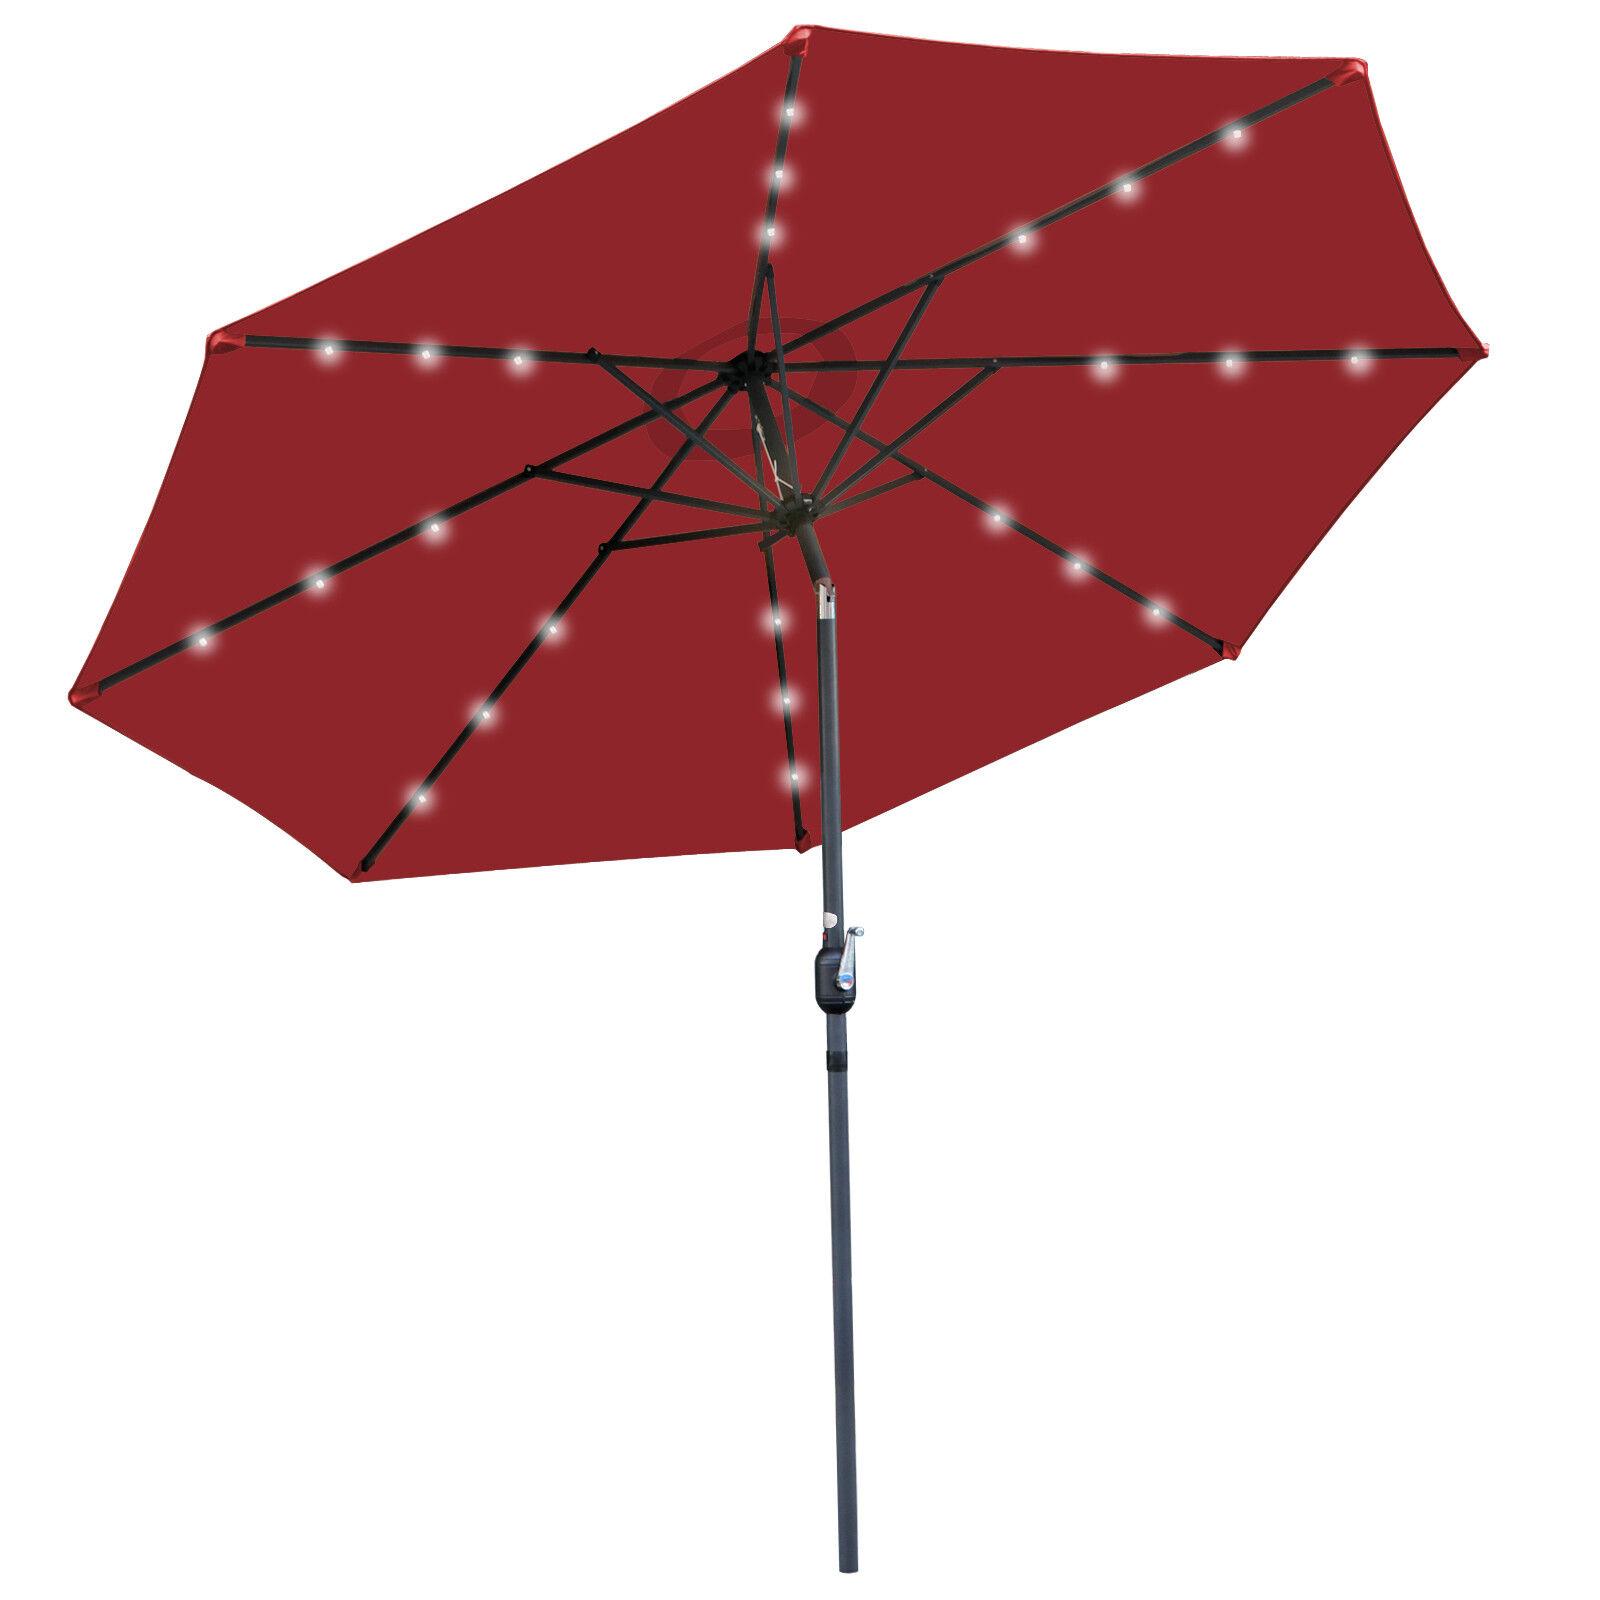 Sunshine Outdoor 10ft Solar Umbrella – 24 LED Light Aluminium Red Tilt Cover Garden Structures & Shade